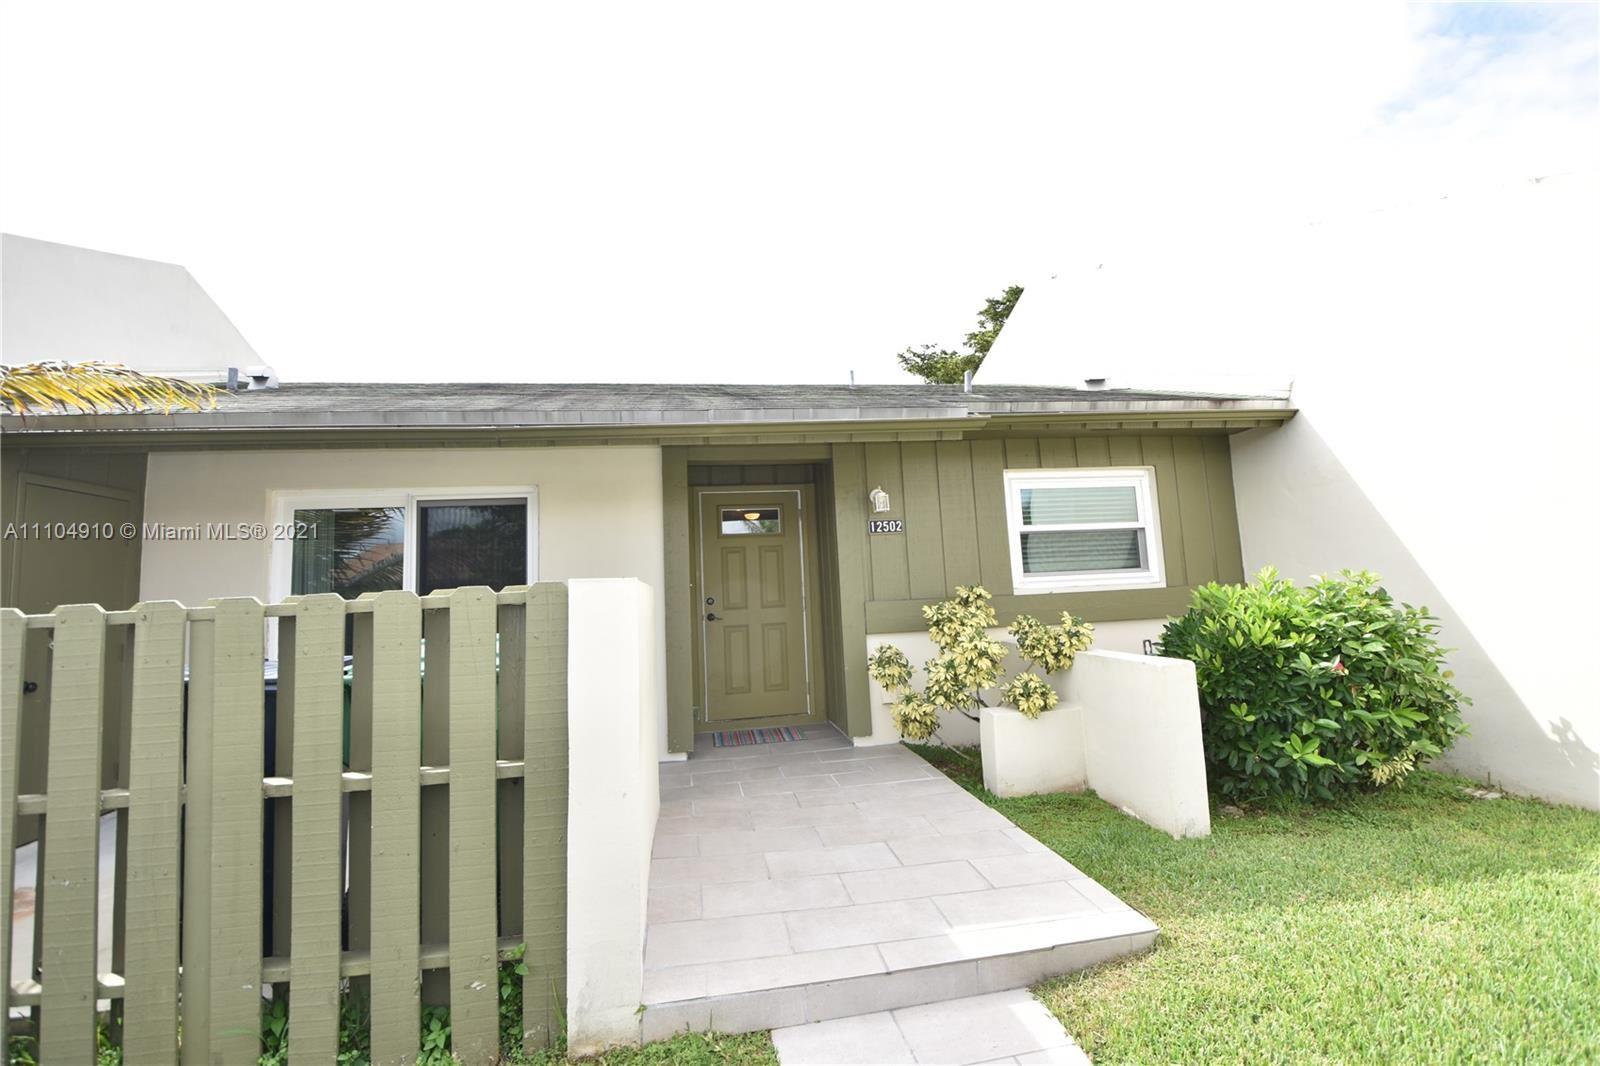 12502 SW 110th S Canal Street Rd, Miami, FL 33186 - #: A11104910